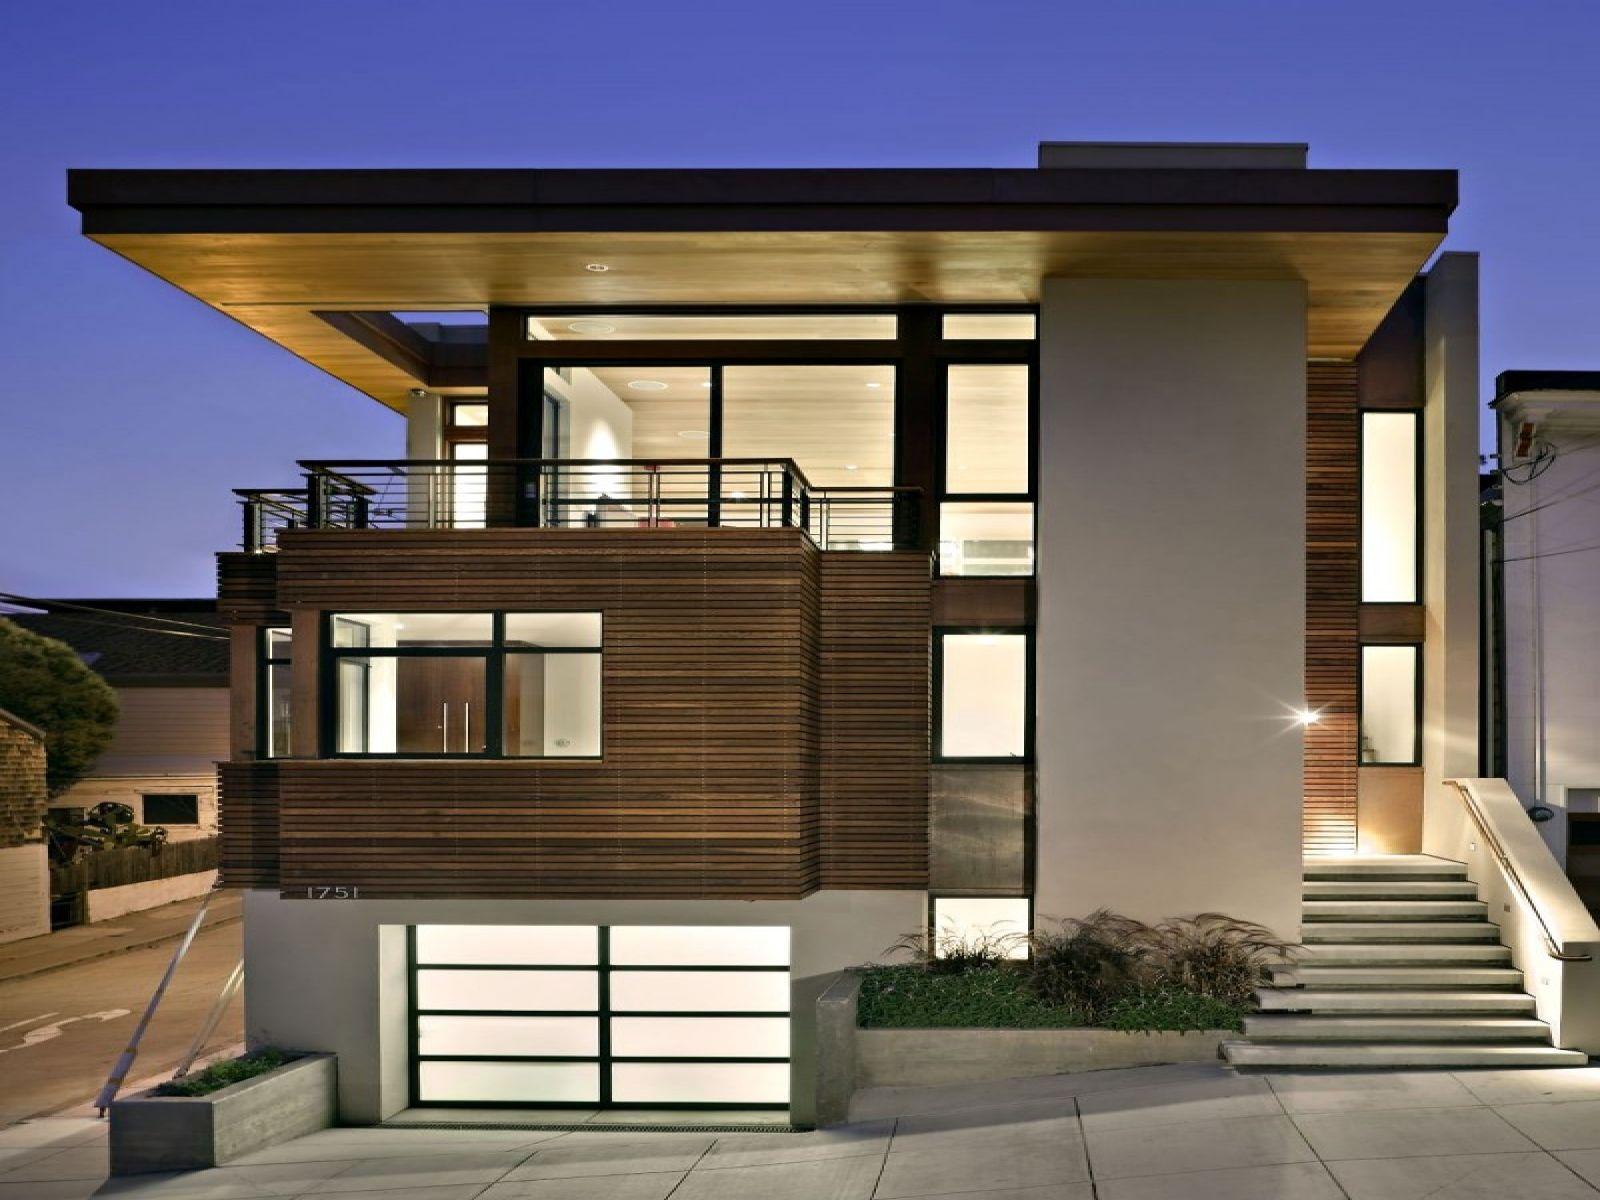 S Google Com Search?q=modern House Design House